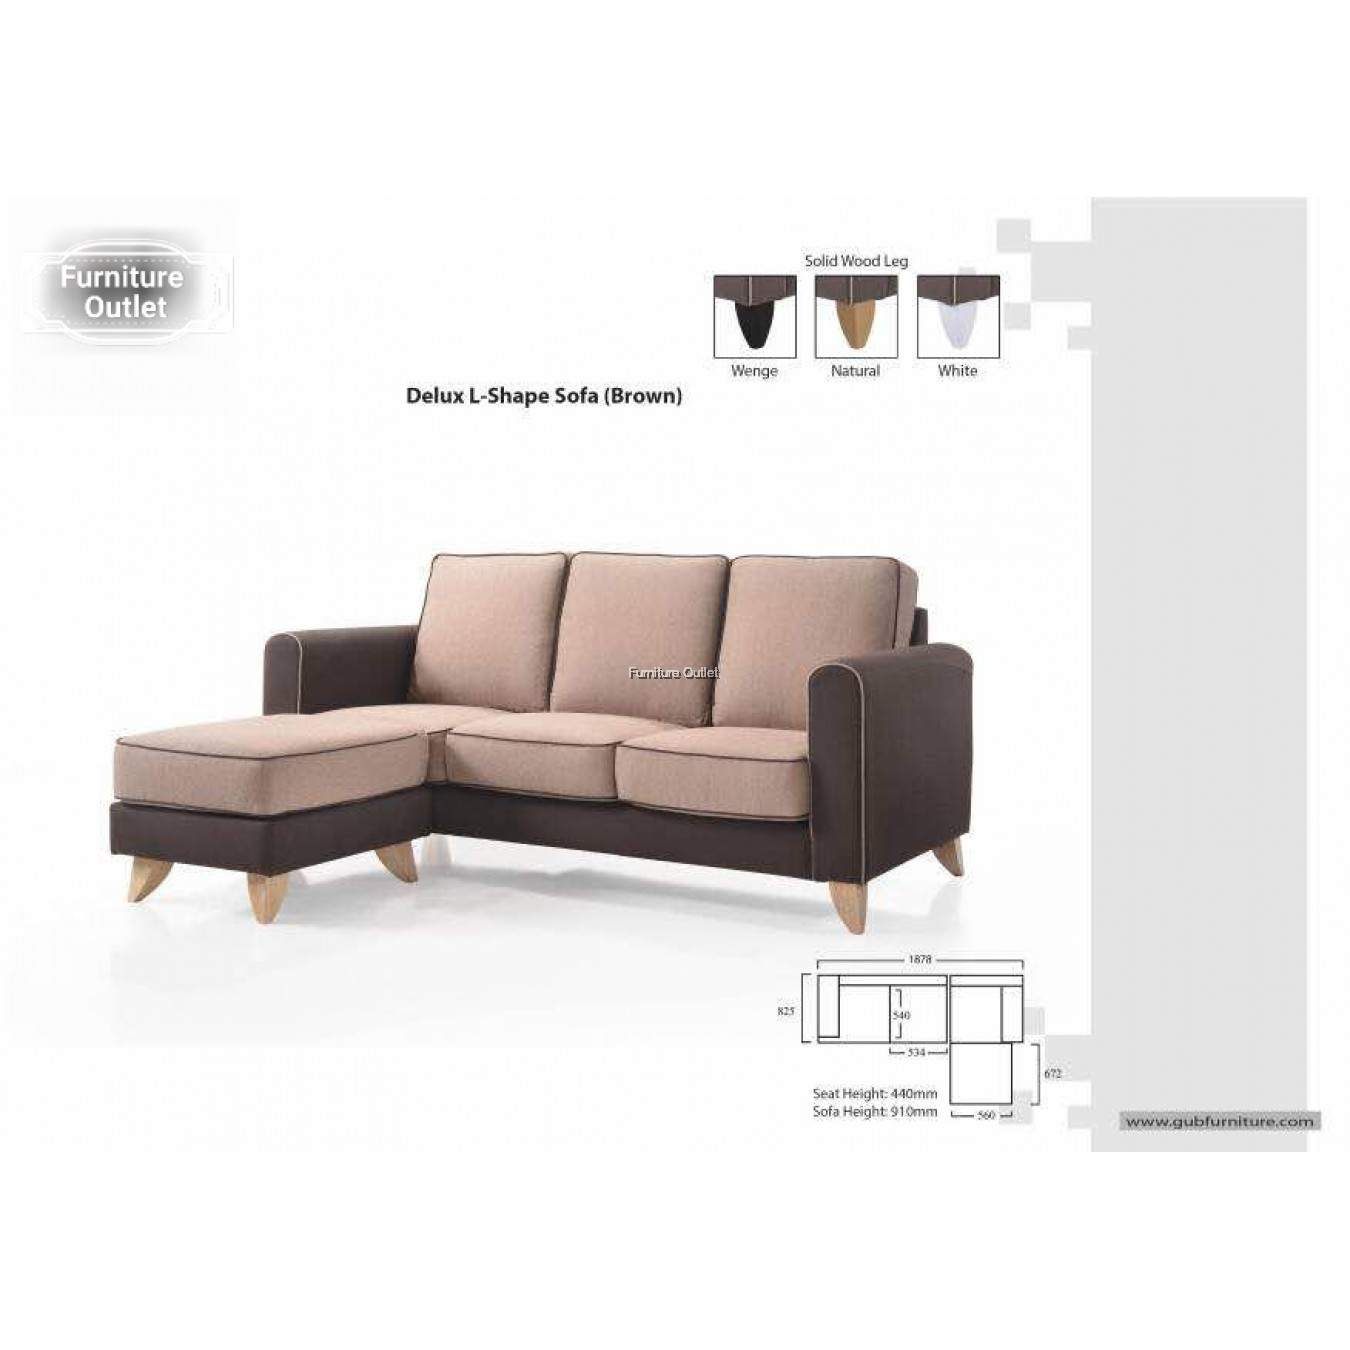 L-Shape Sofa 3 Seater + Stool